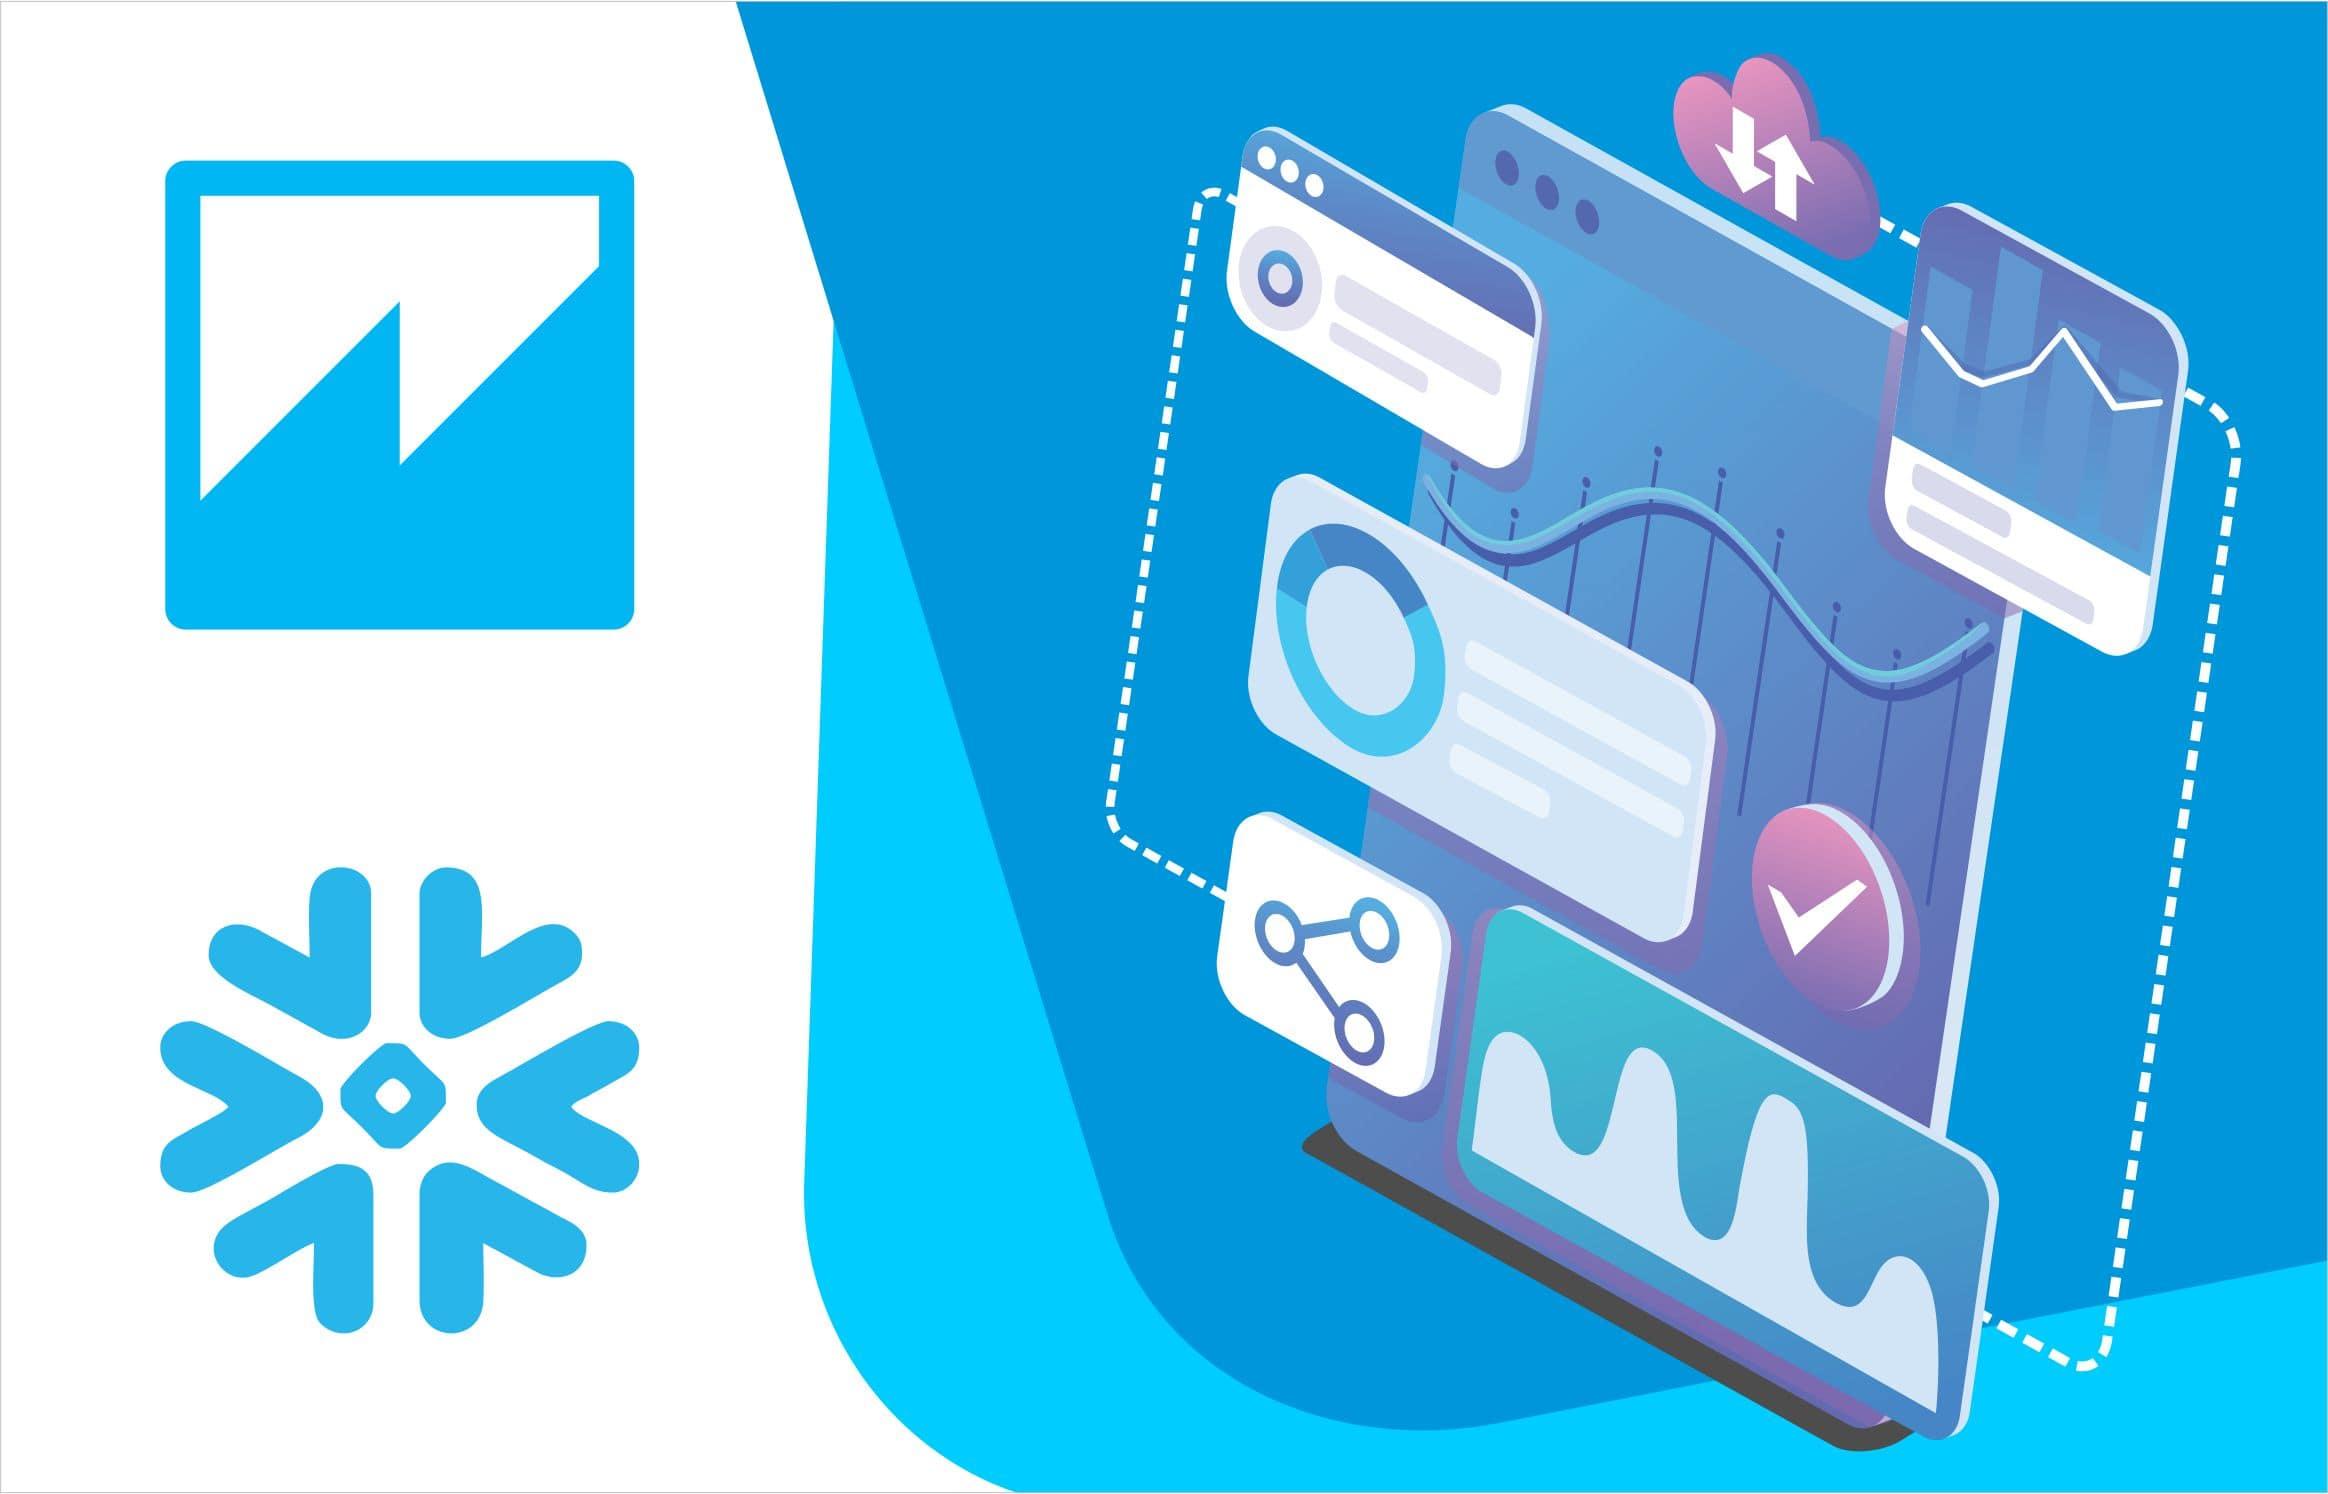 Intellicompute | AWS Analytic tool QuickSight using Snowflake Warehouse